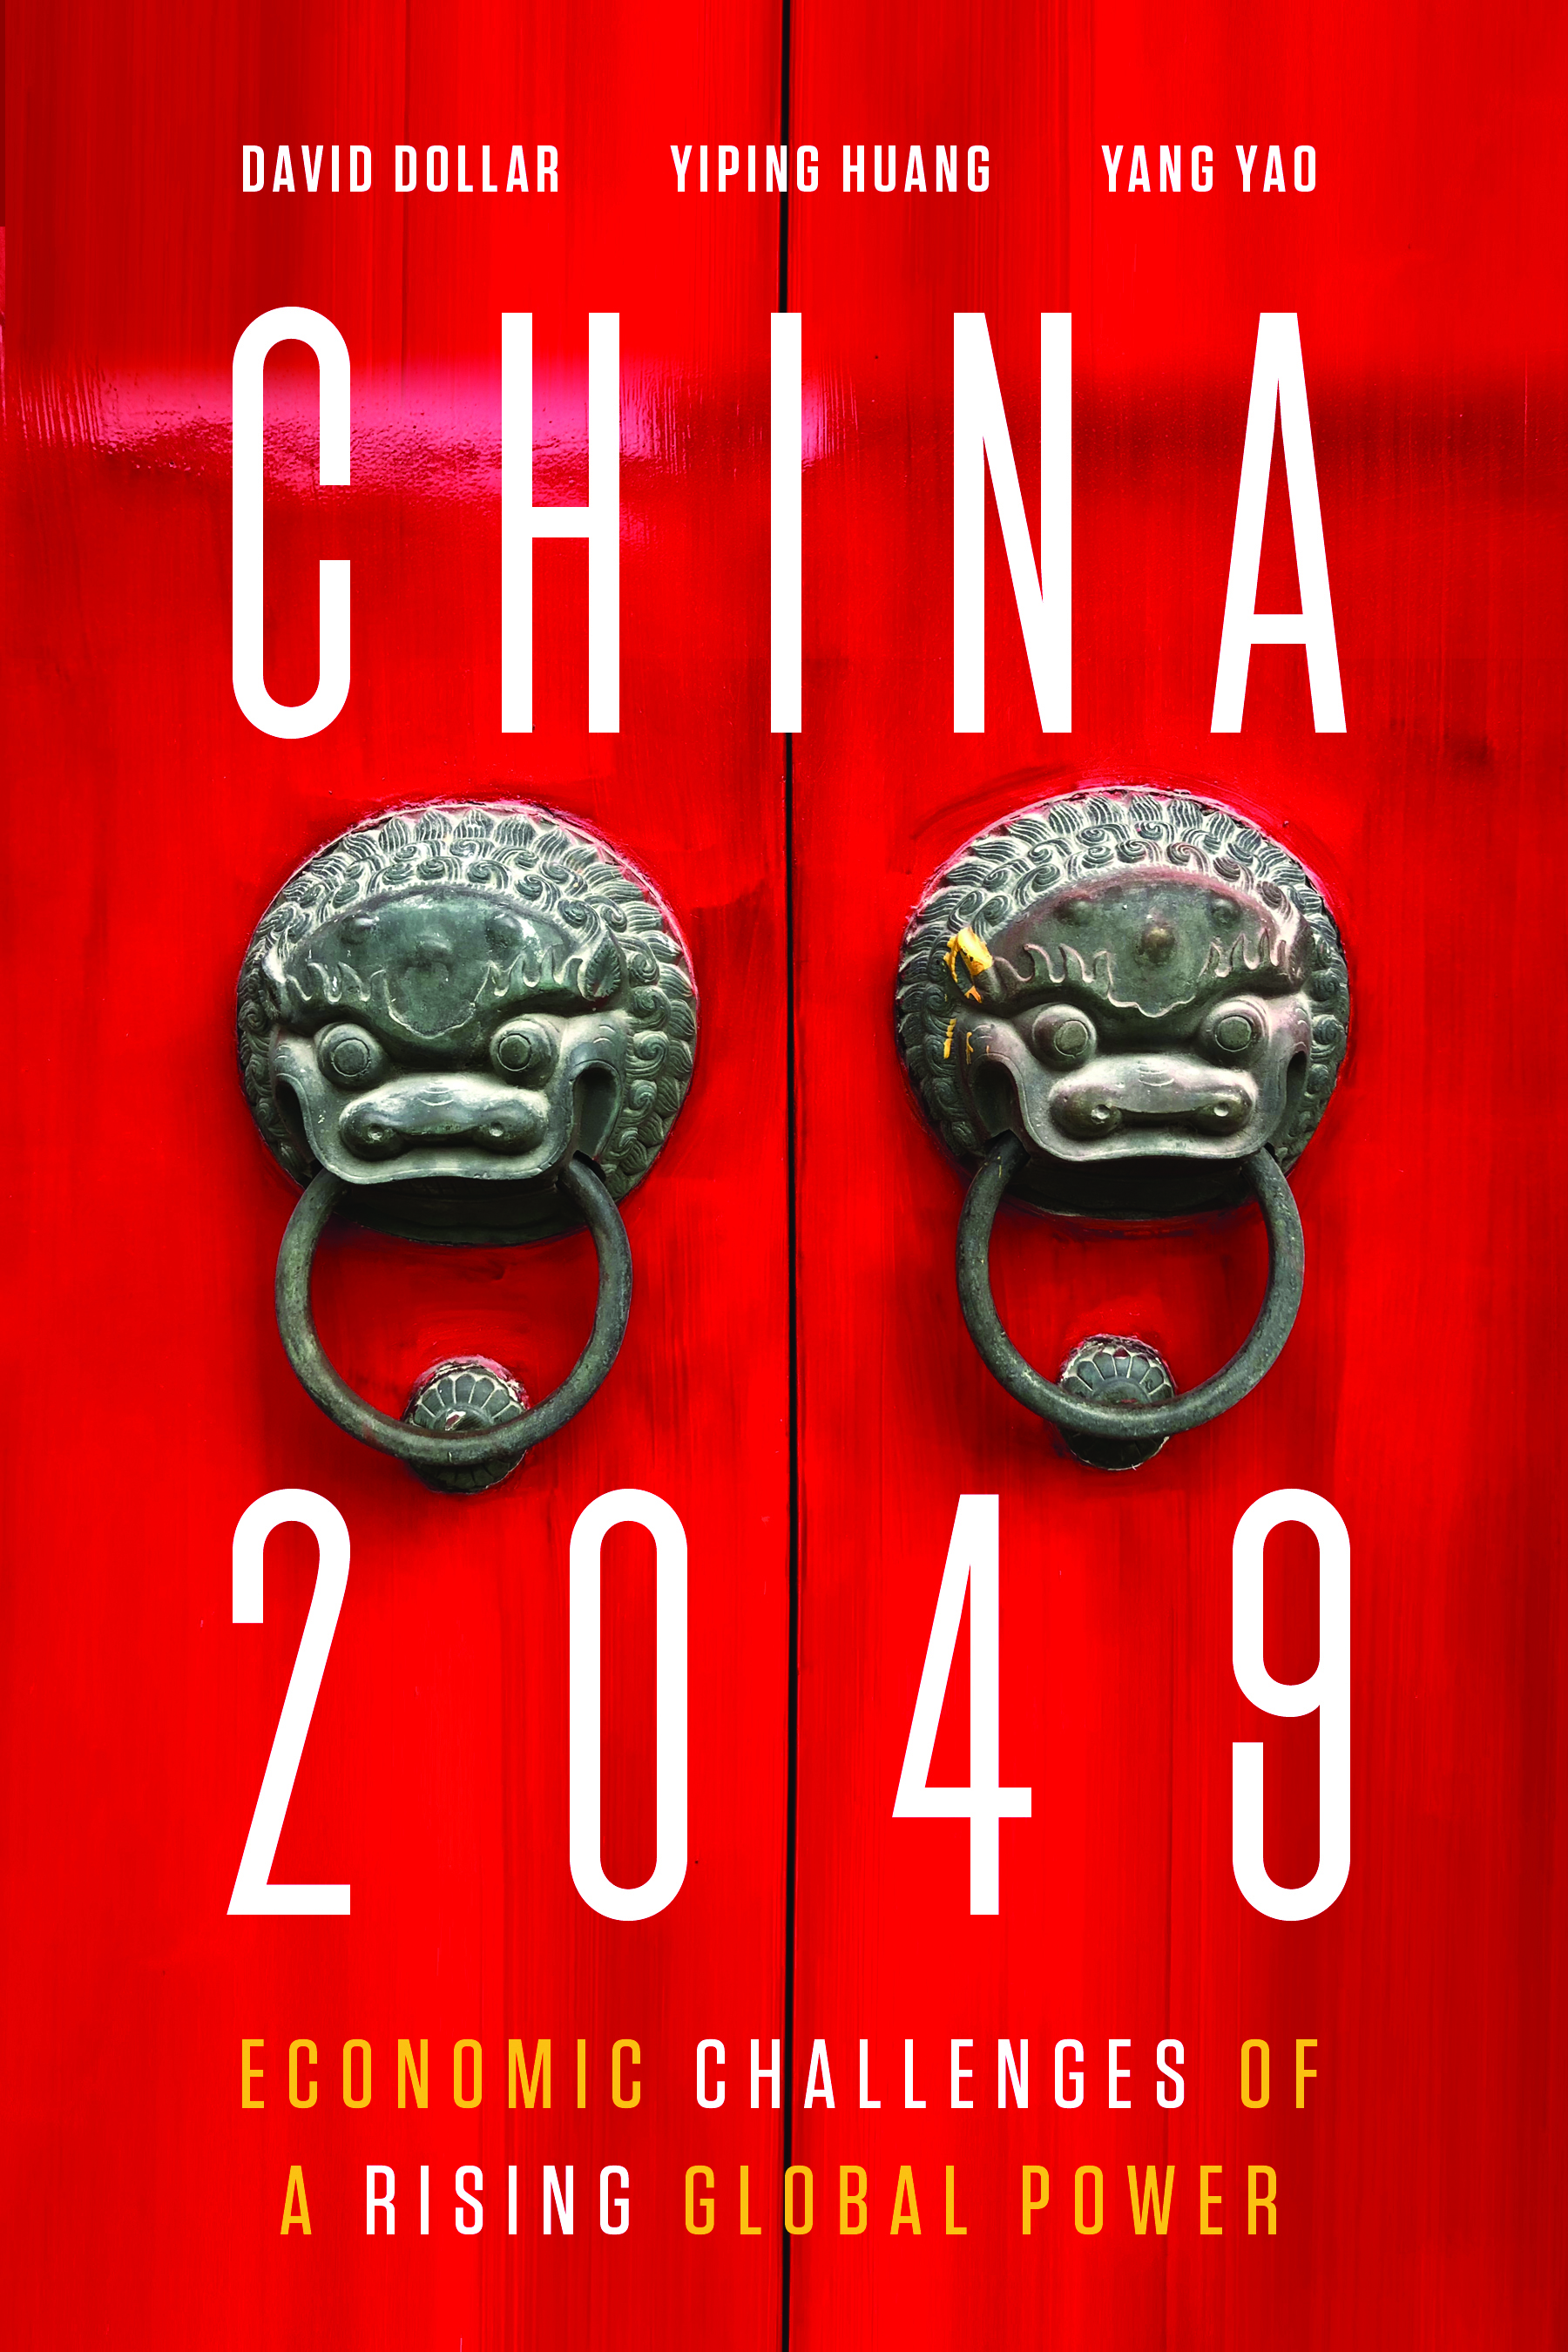 Cvr: China 2049